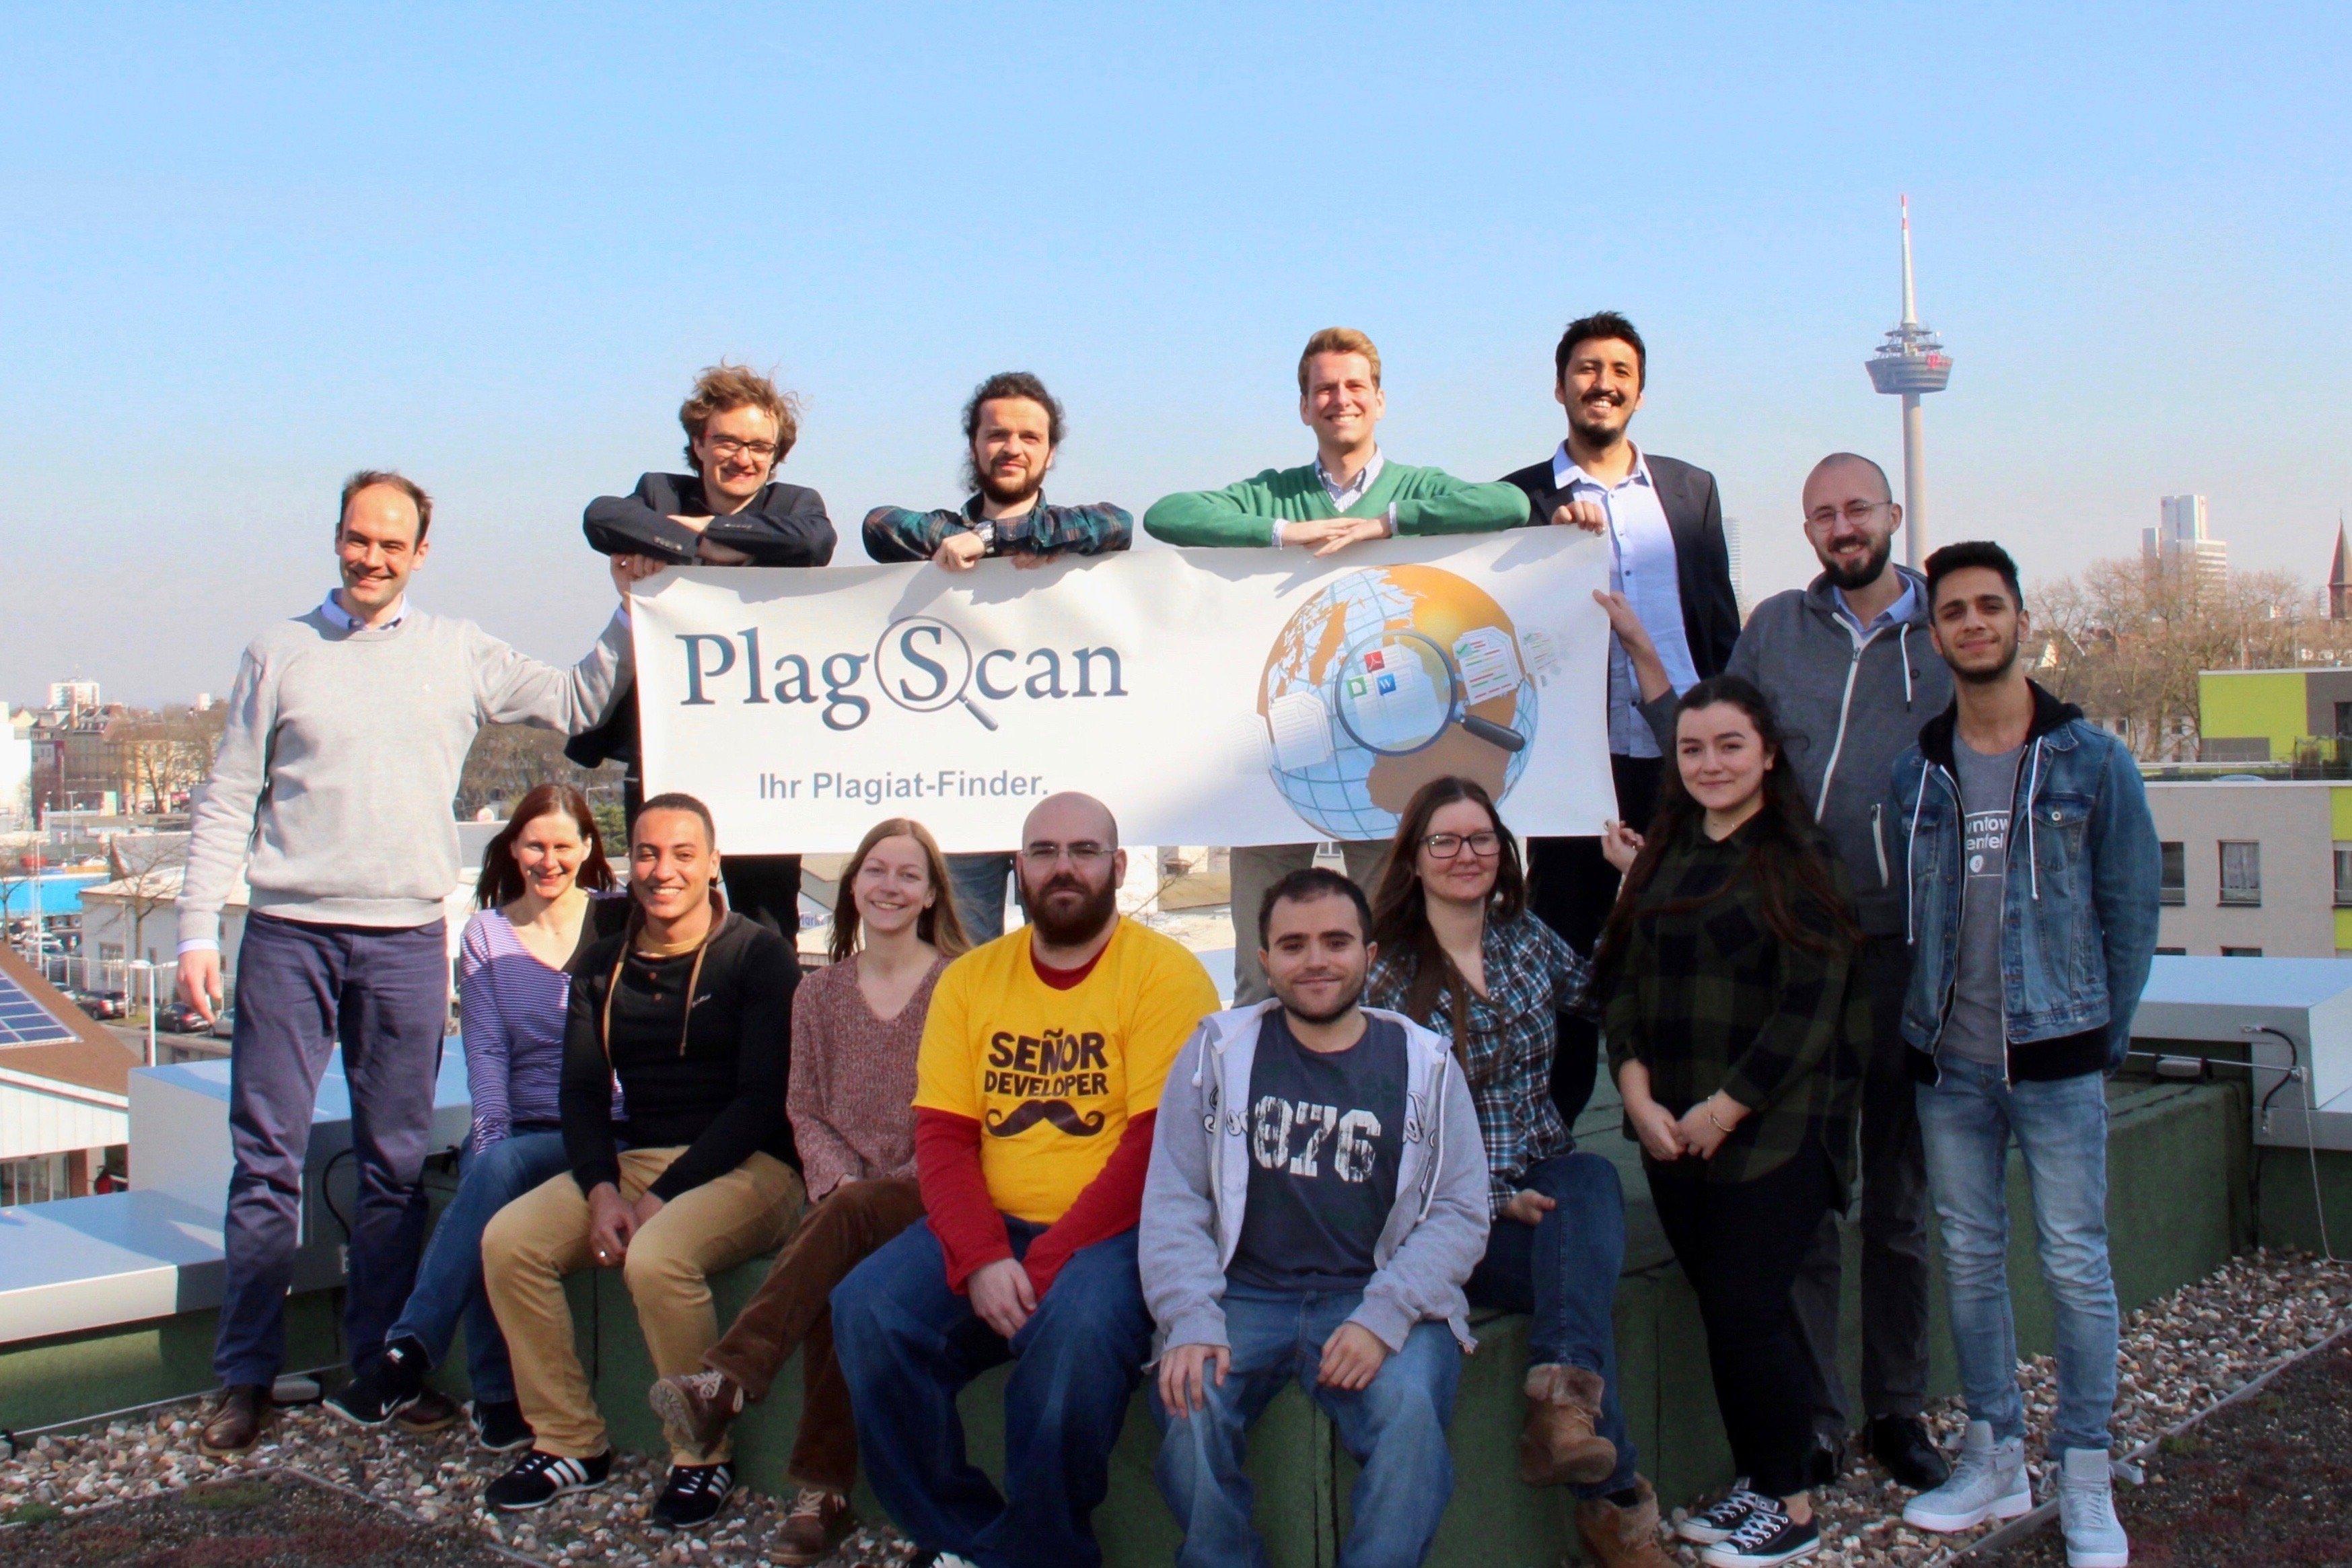 Team of PlagScan 2017